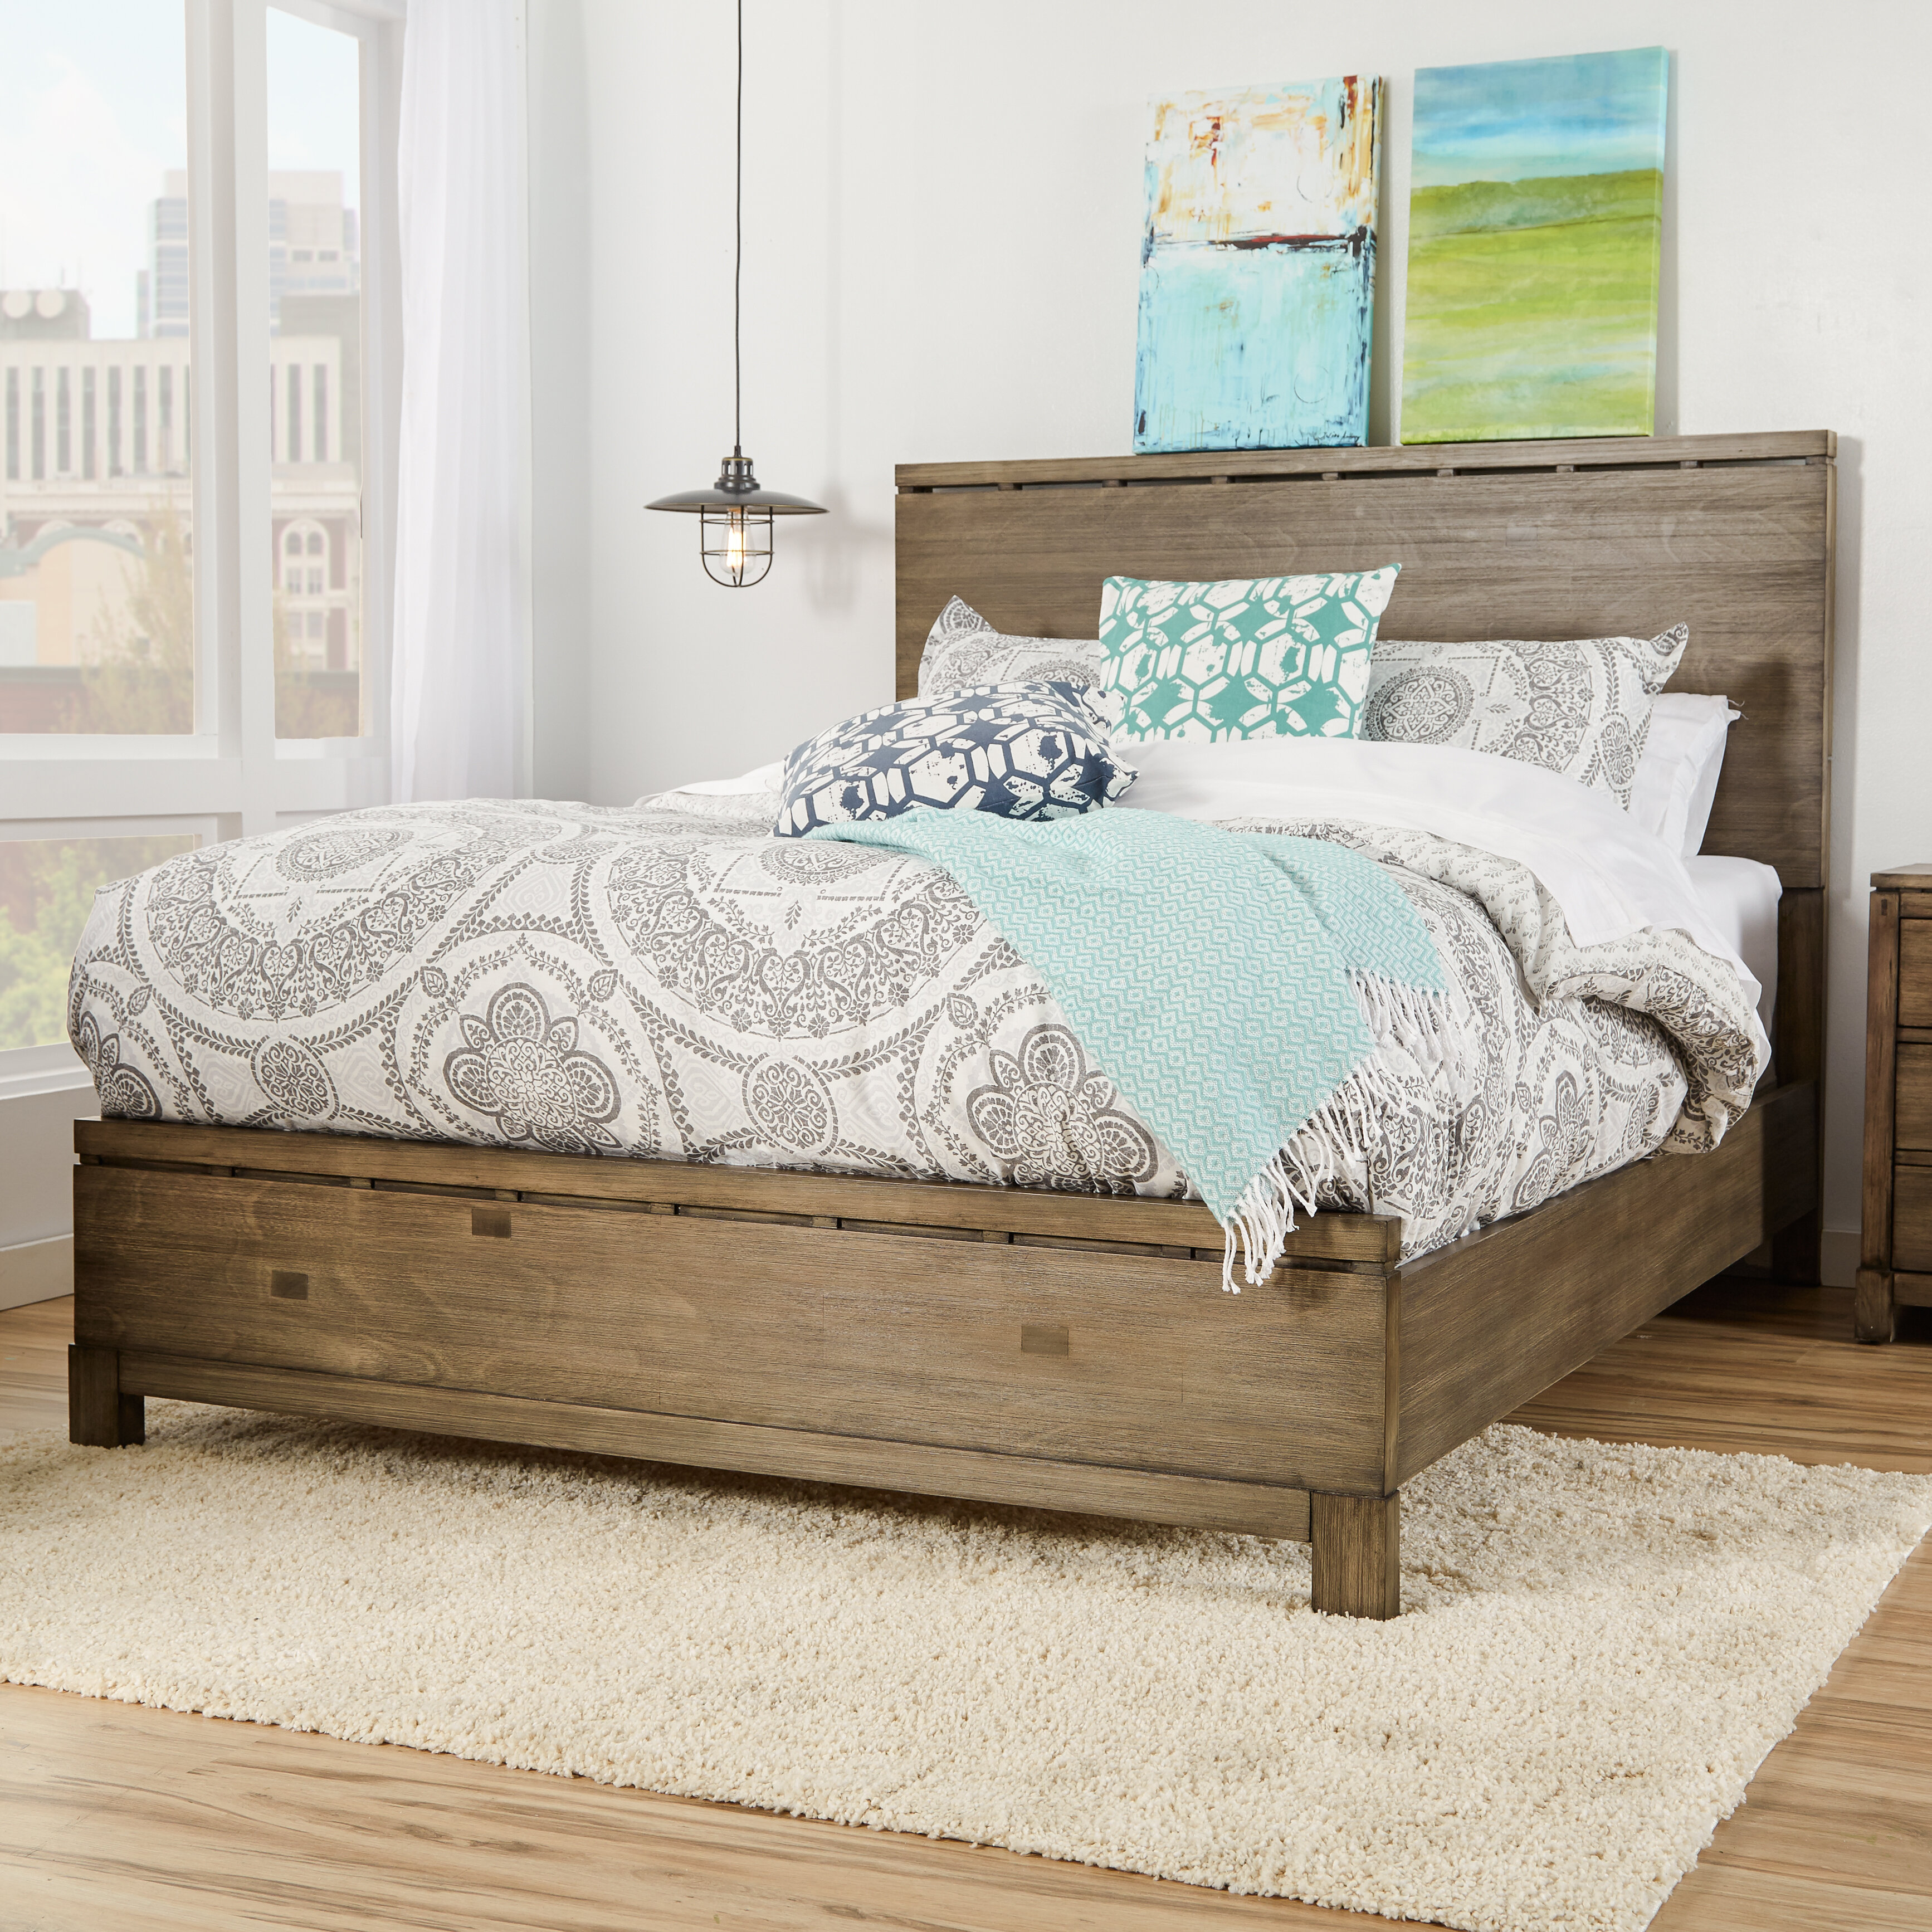 Mercury Row Pax Panel Bed & Reviews | Wayfair